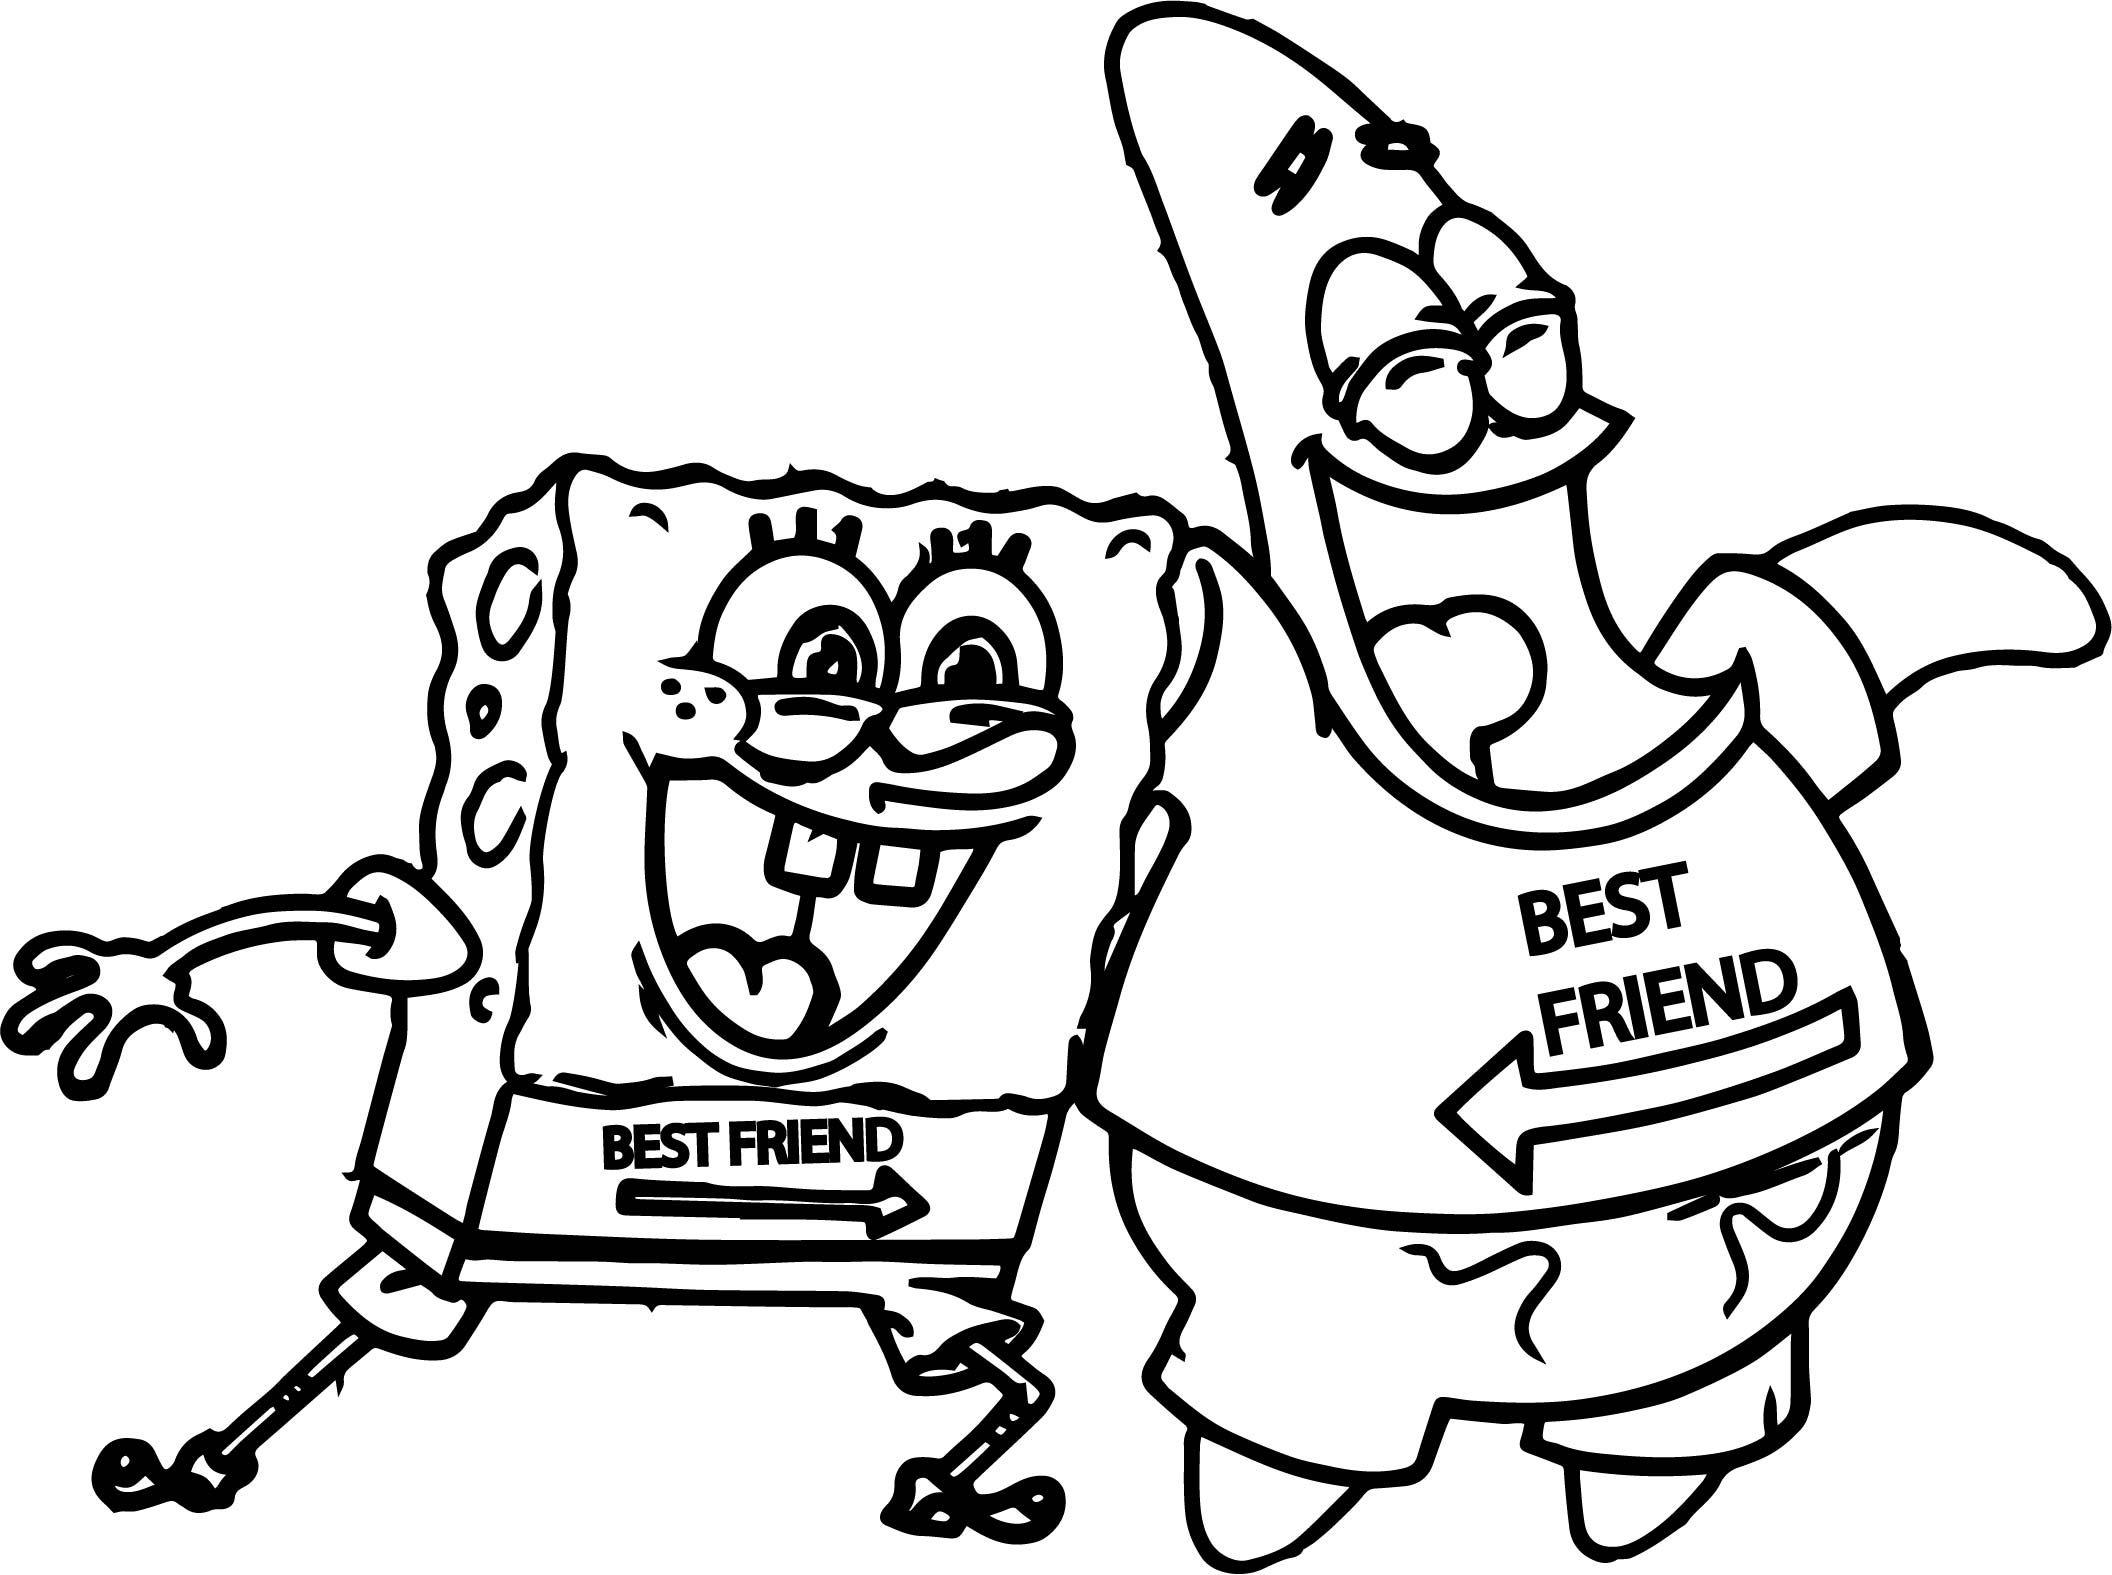 Nice Sponge Sunger Bob Patrick Best Friends Coloring Page Spongebob Drawings Cartoon Coloring Pages Drawings Of Friends